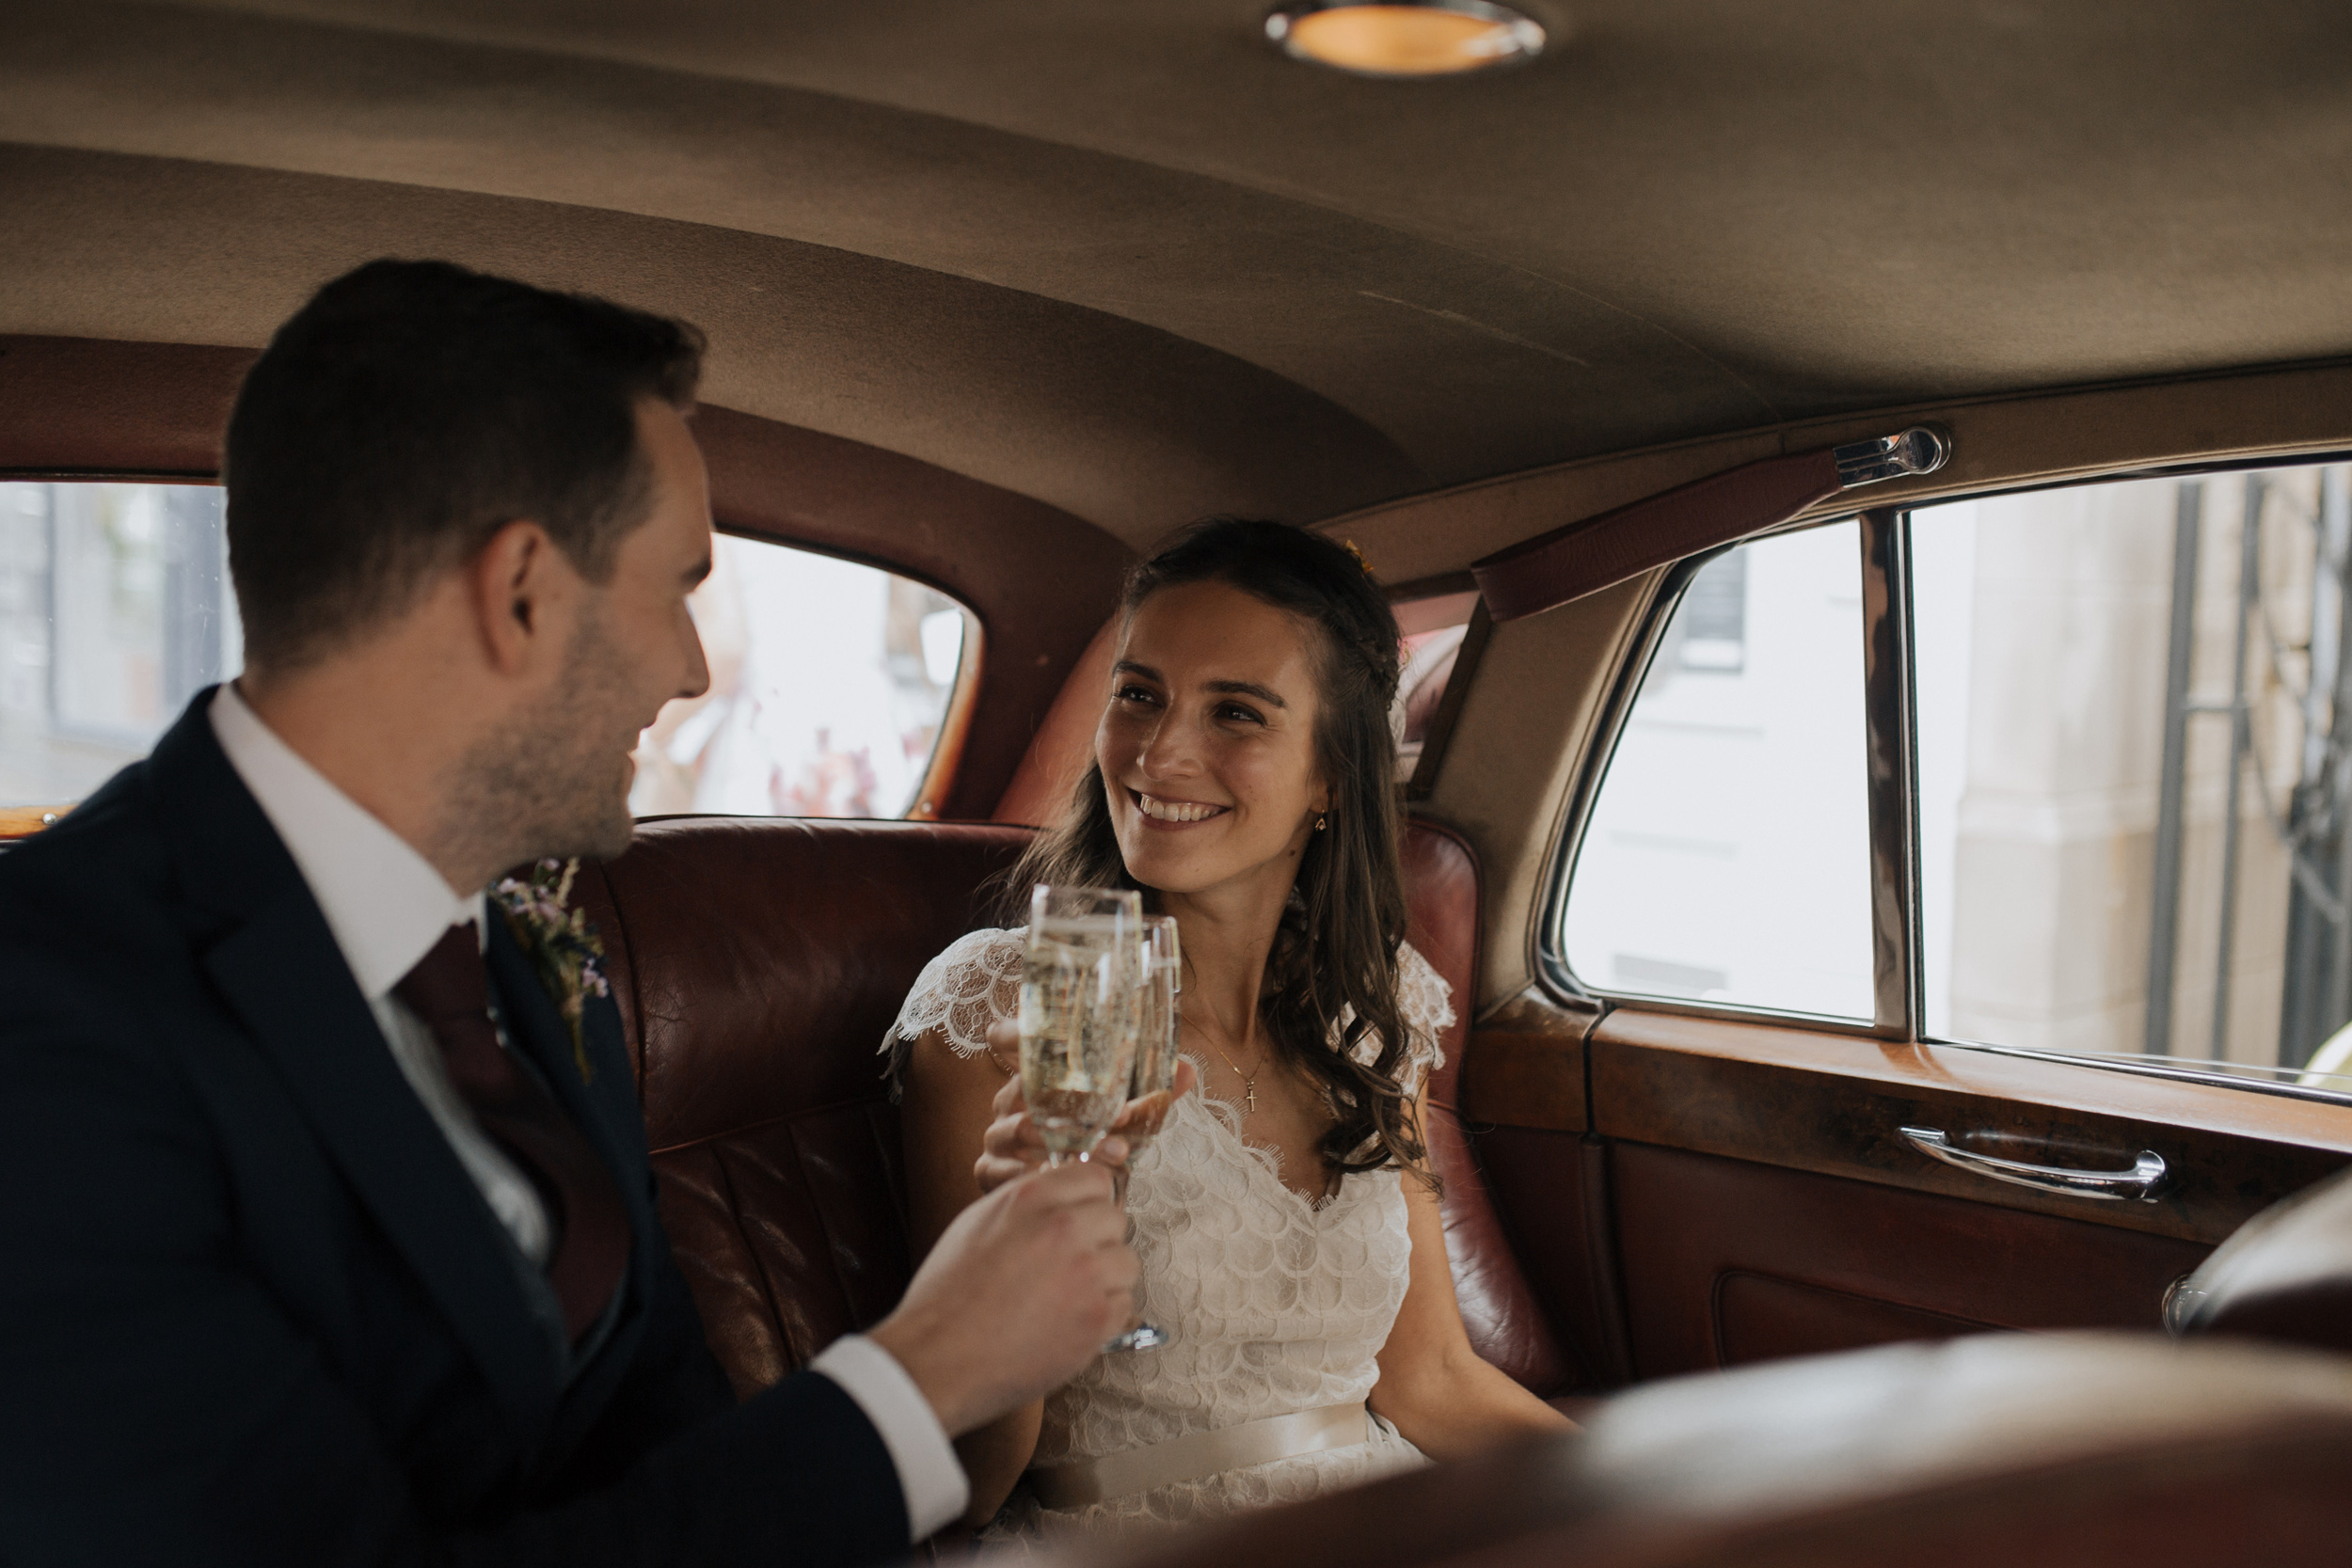 Joasia-Kate-Beaumont-Bohemian-Lace-Wedding-Dress-Peak-District-Sheffield-Wedding-19.jpg